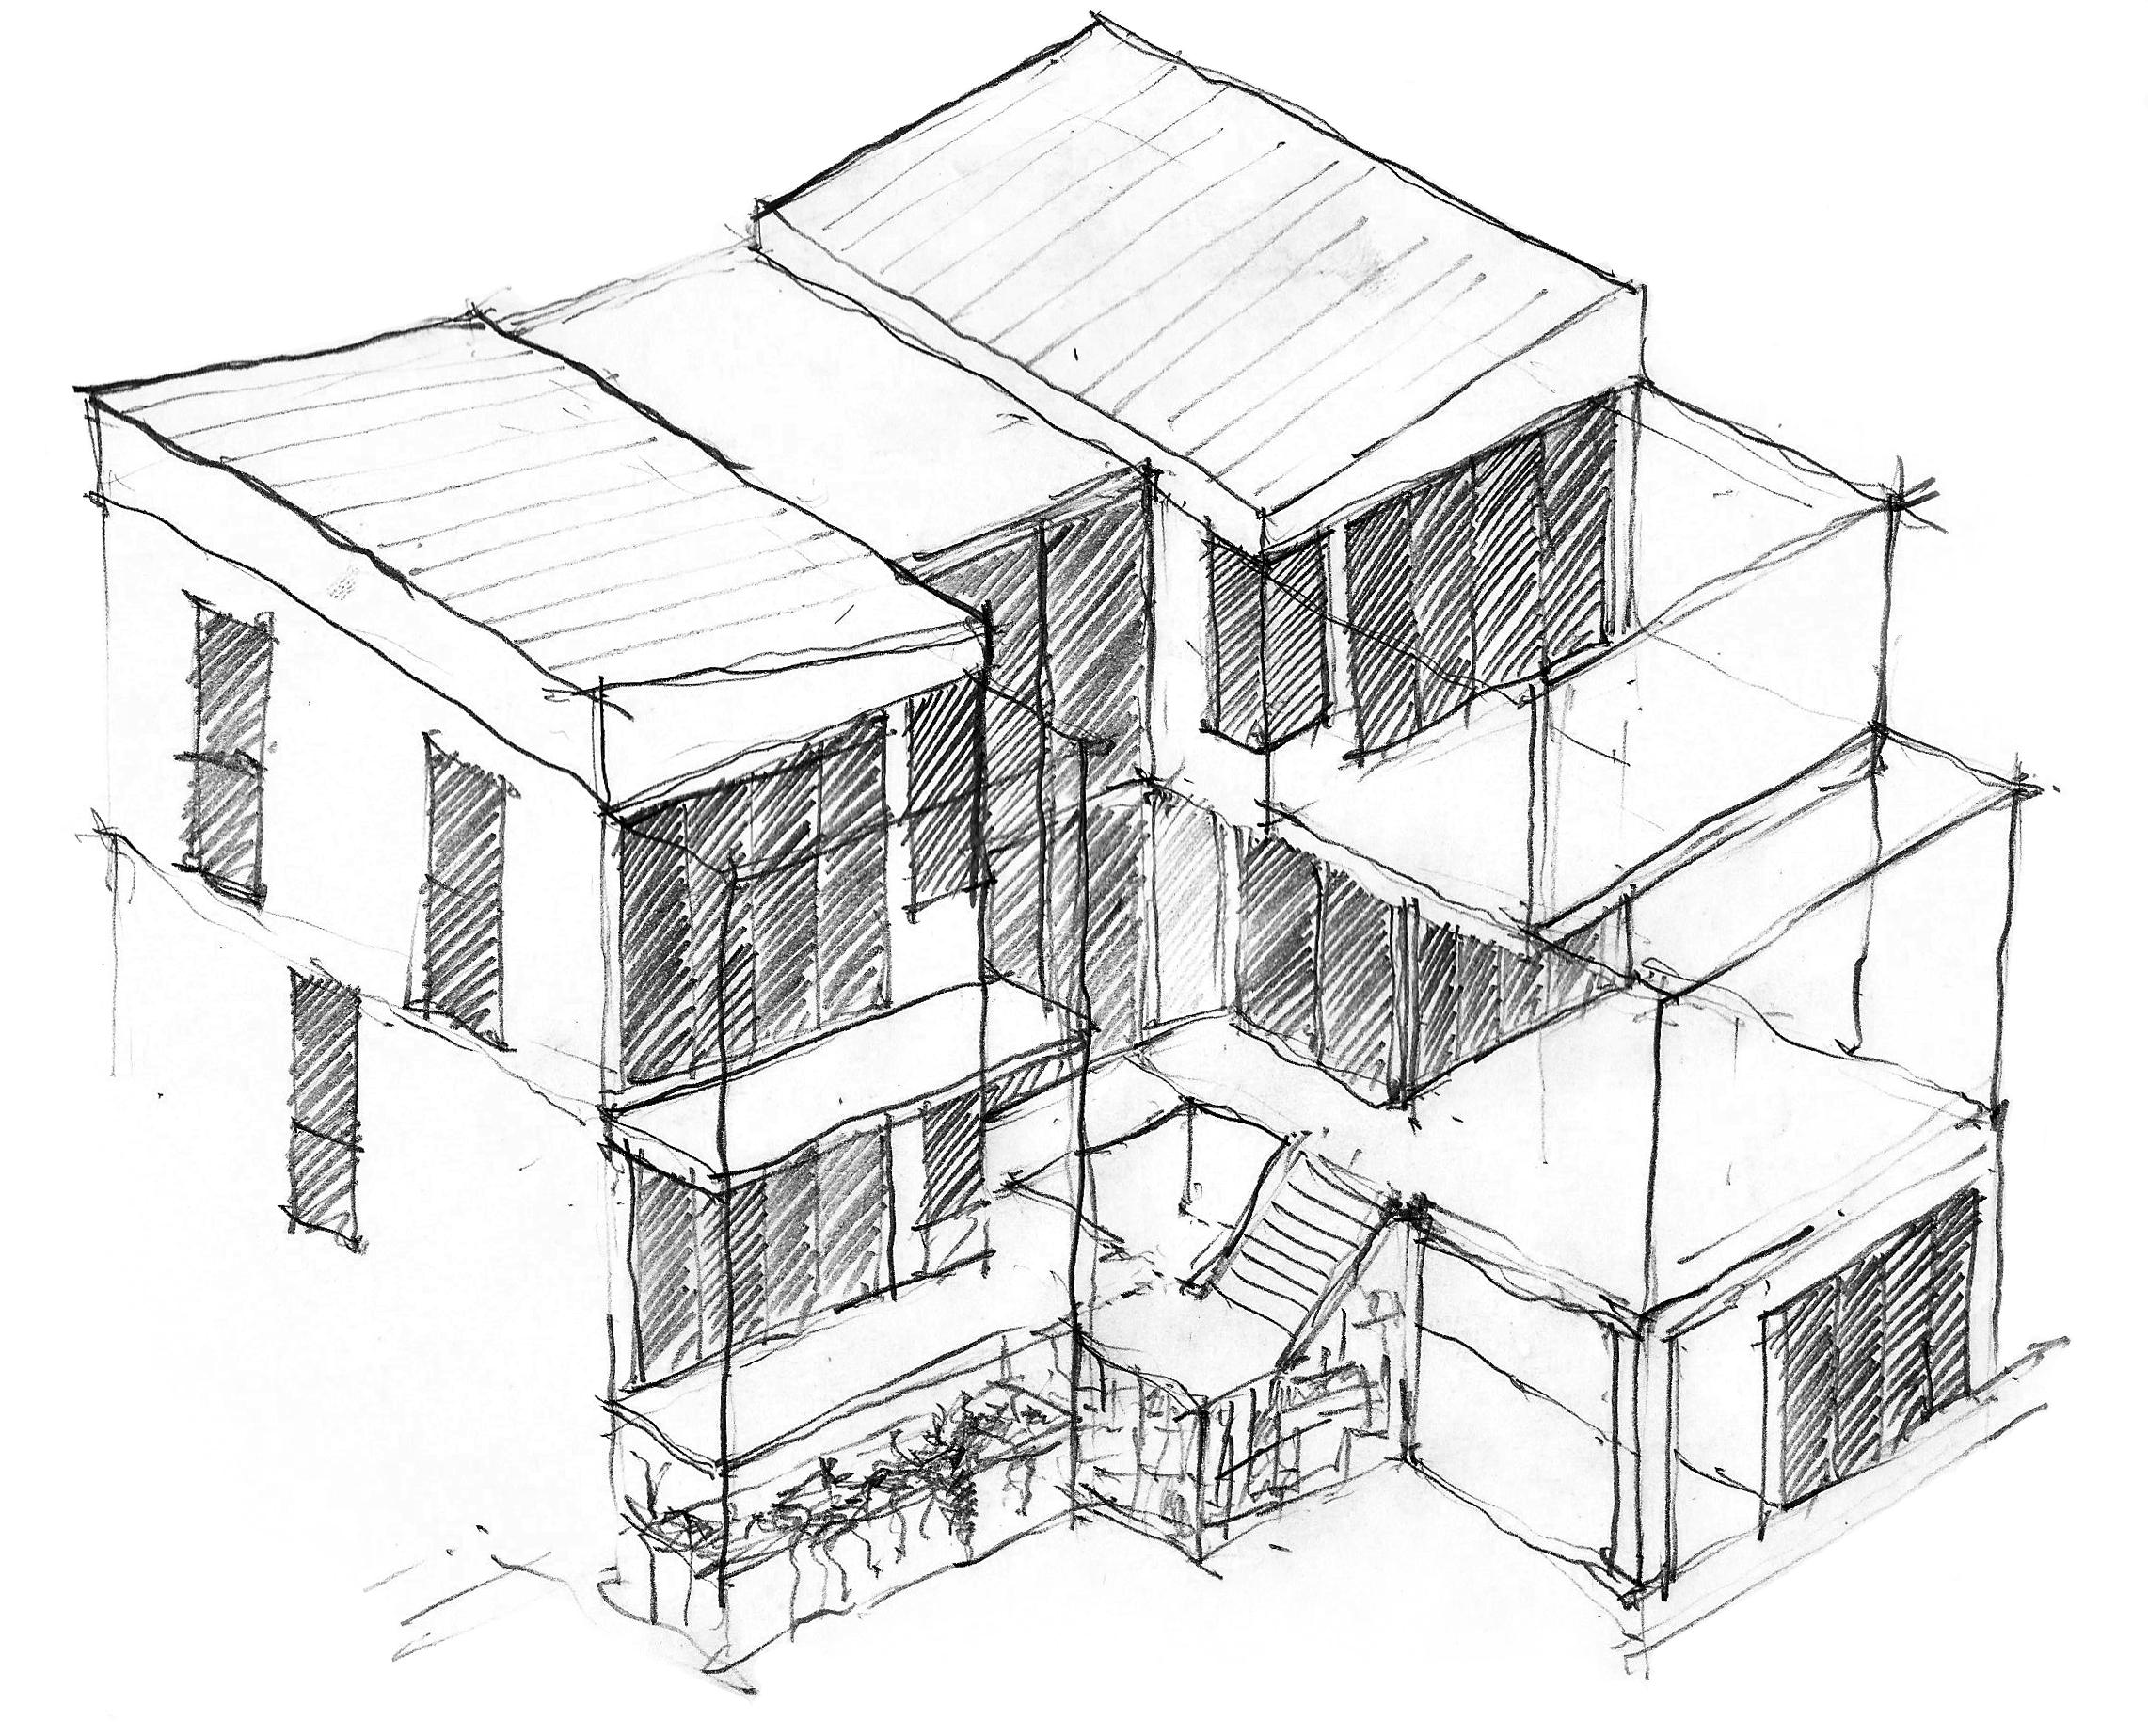 2283x1845 Camps Bay House Ross Mc Donald